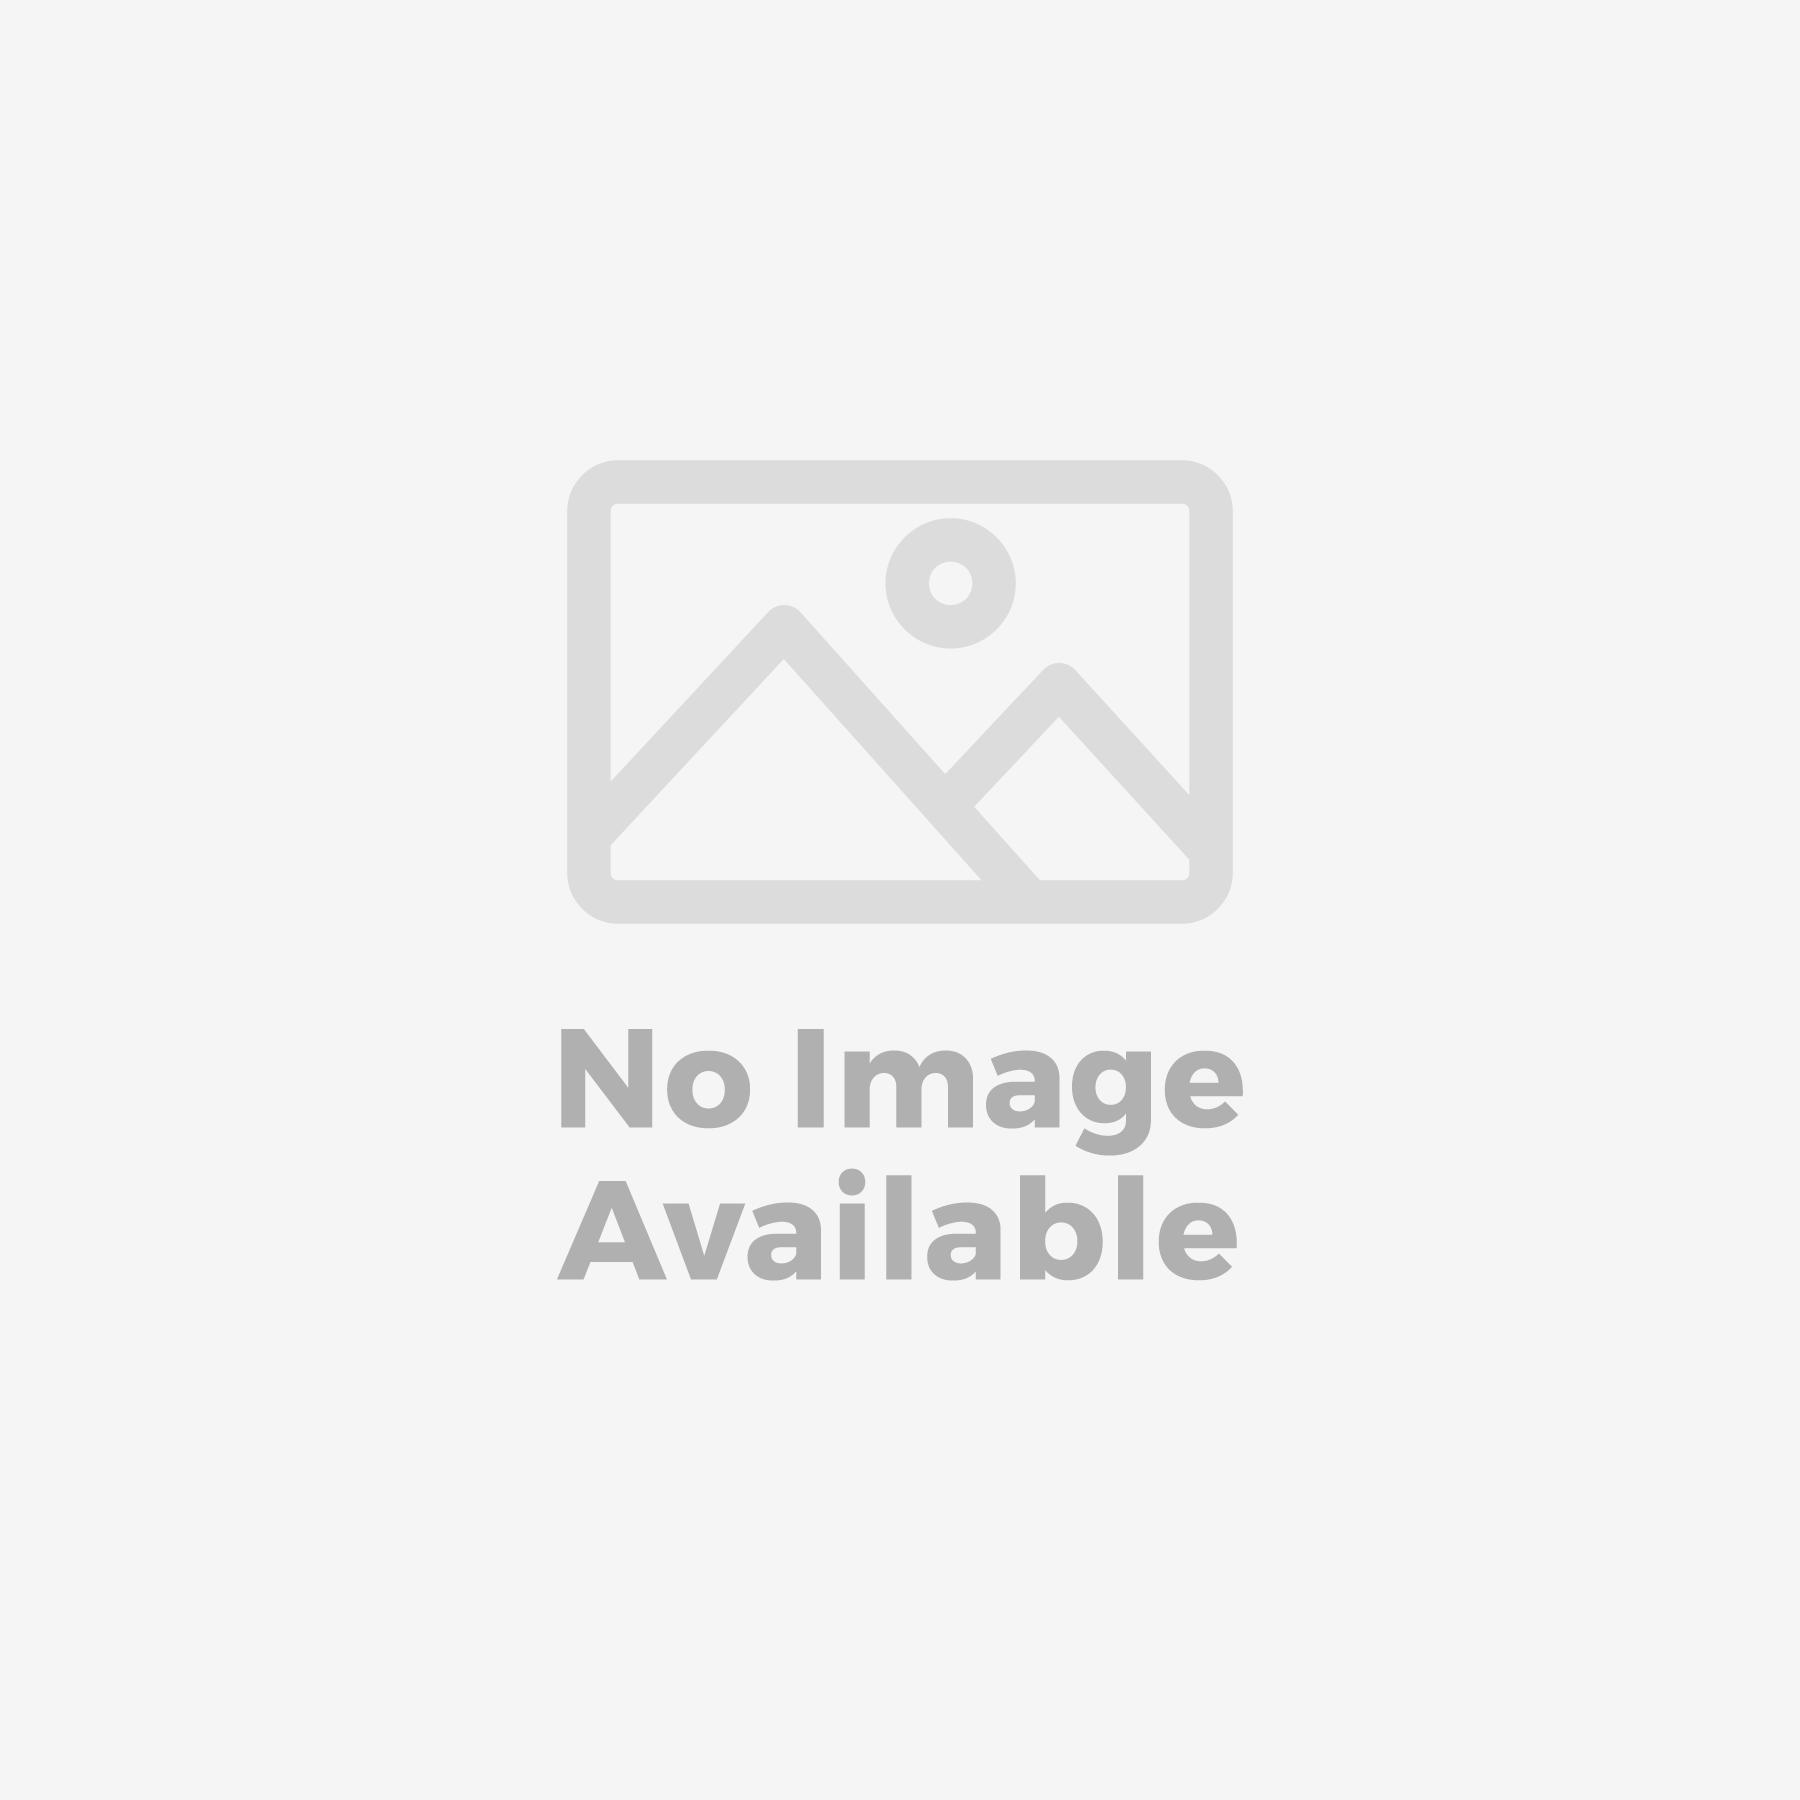 SOIE - Sofa Table w/Slimstone Top